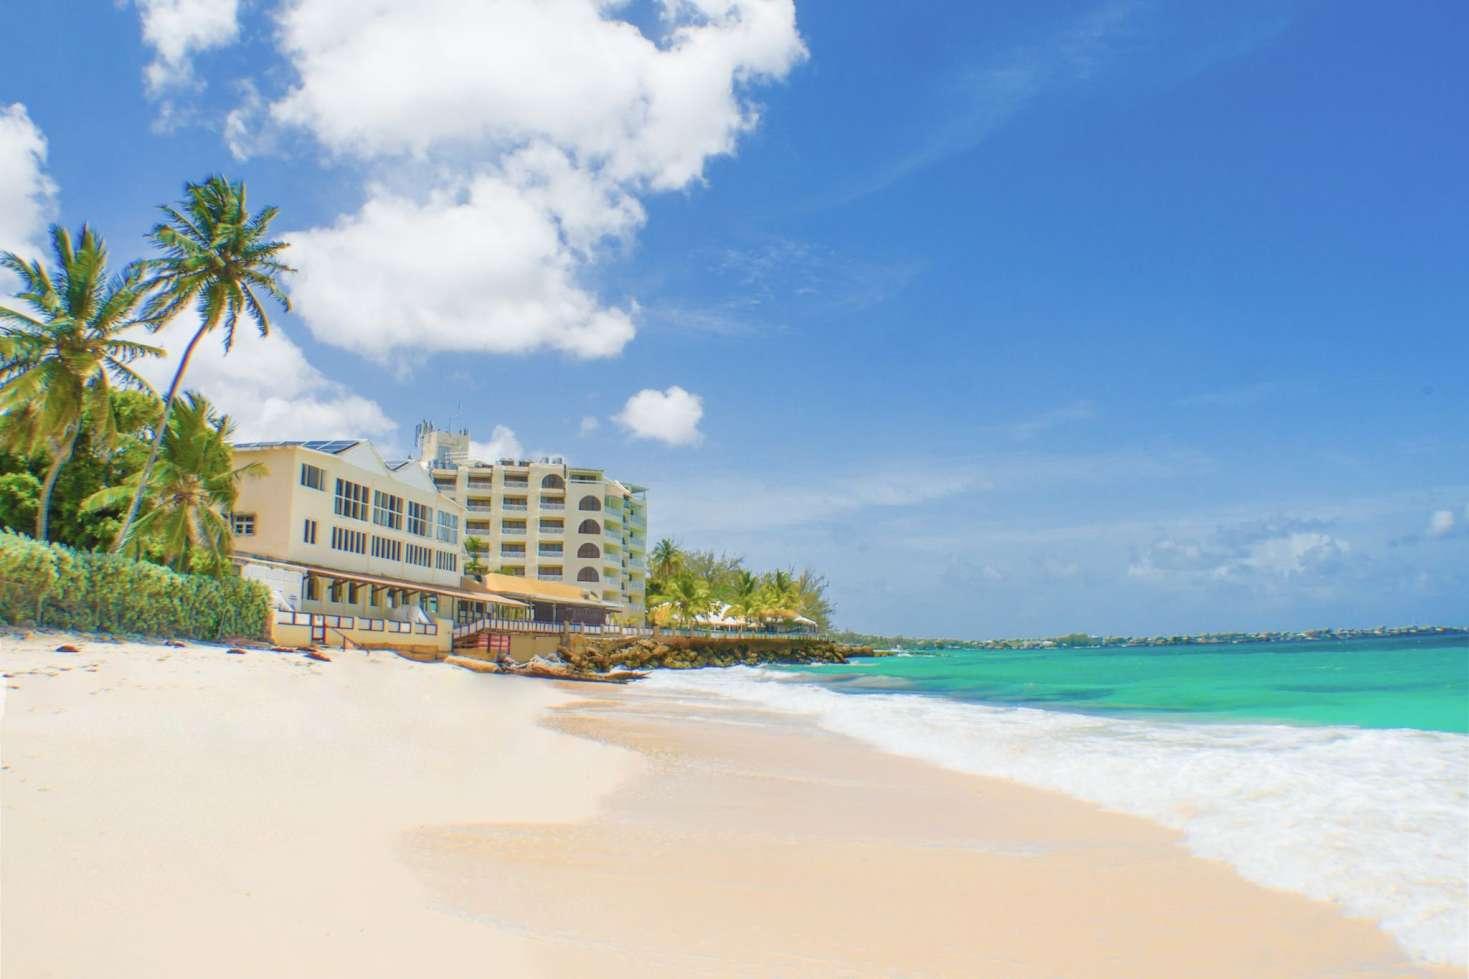 Bargain Barbados All-Inclusive Week w/FREE Superior Room Upgrade  - Save 40%